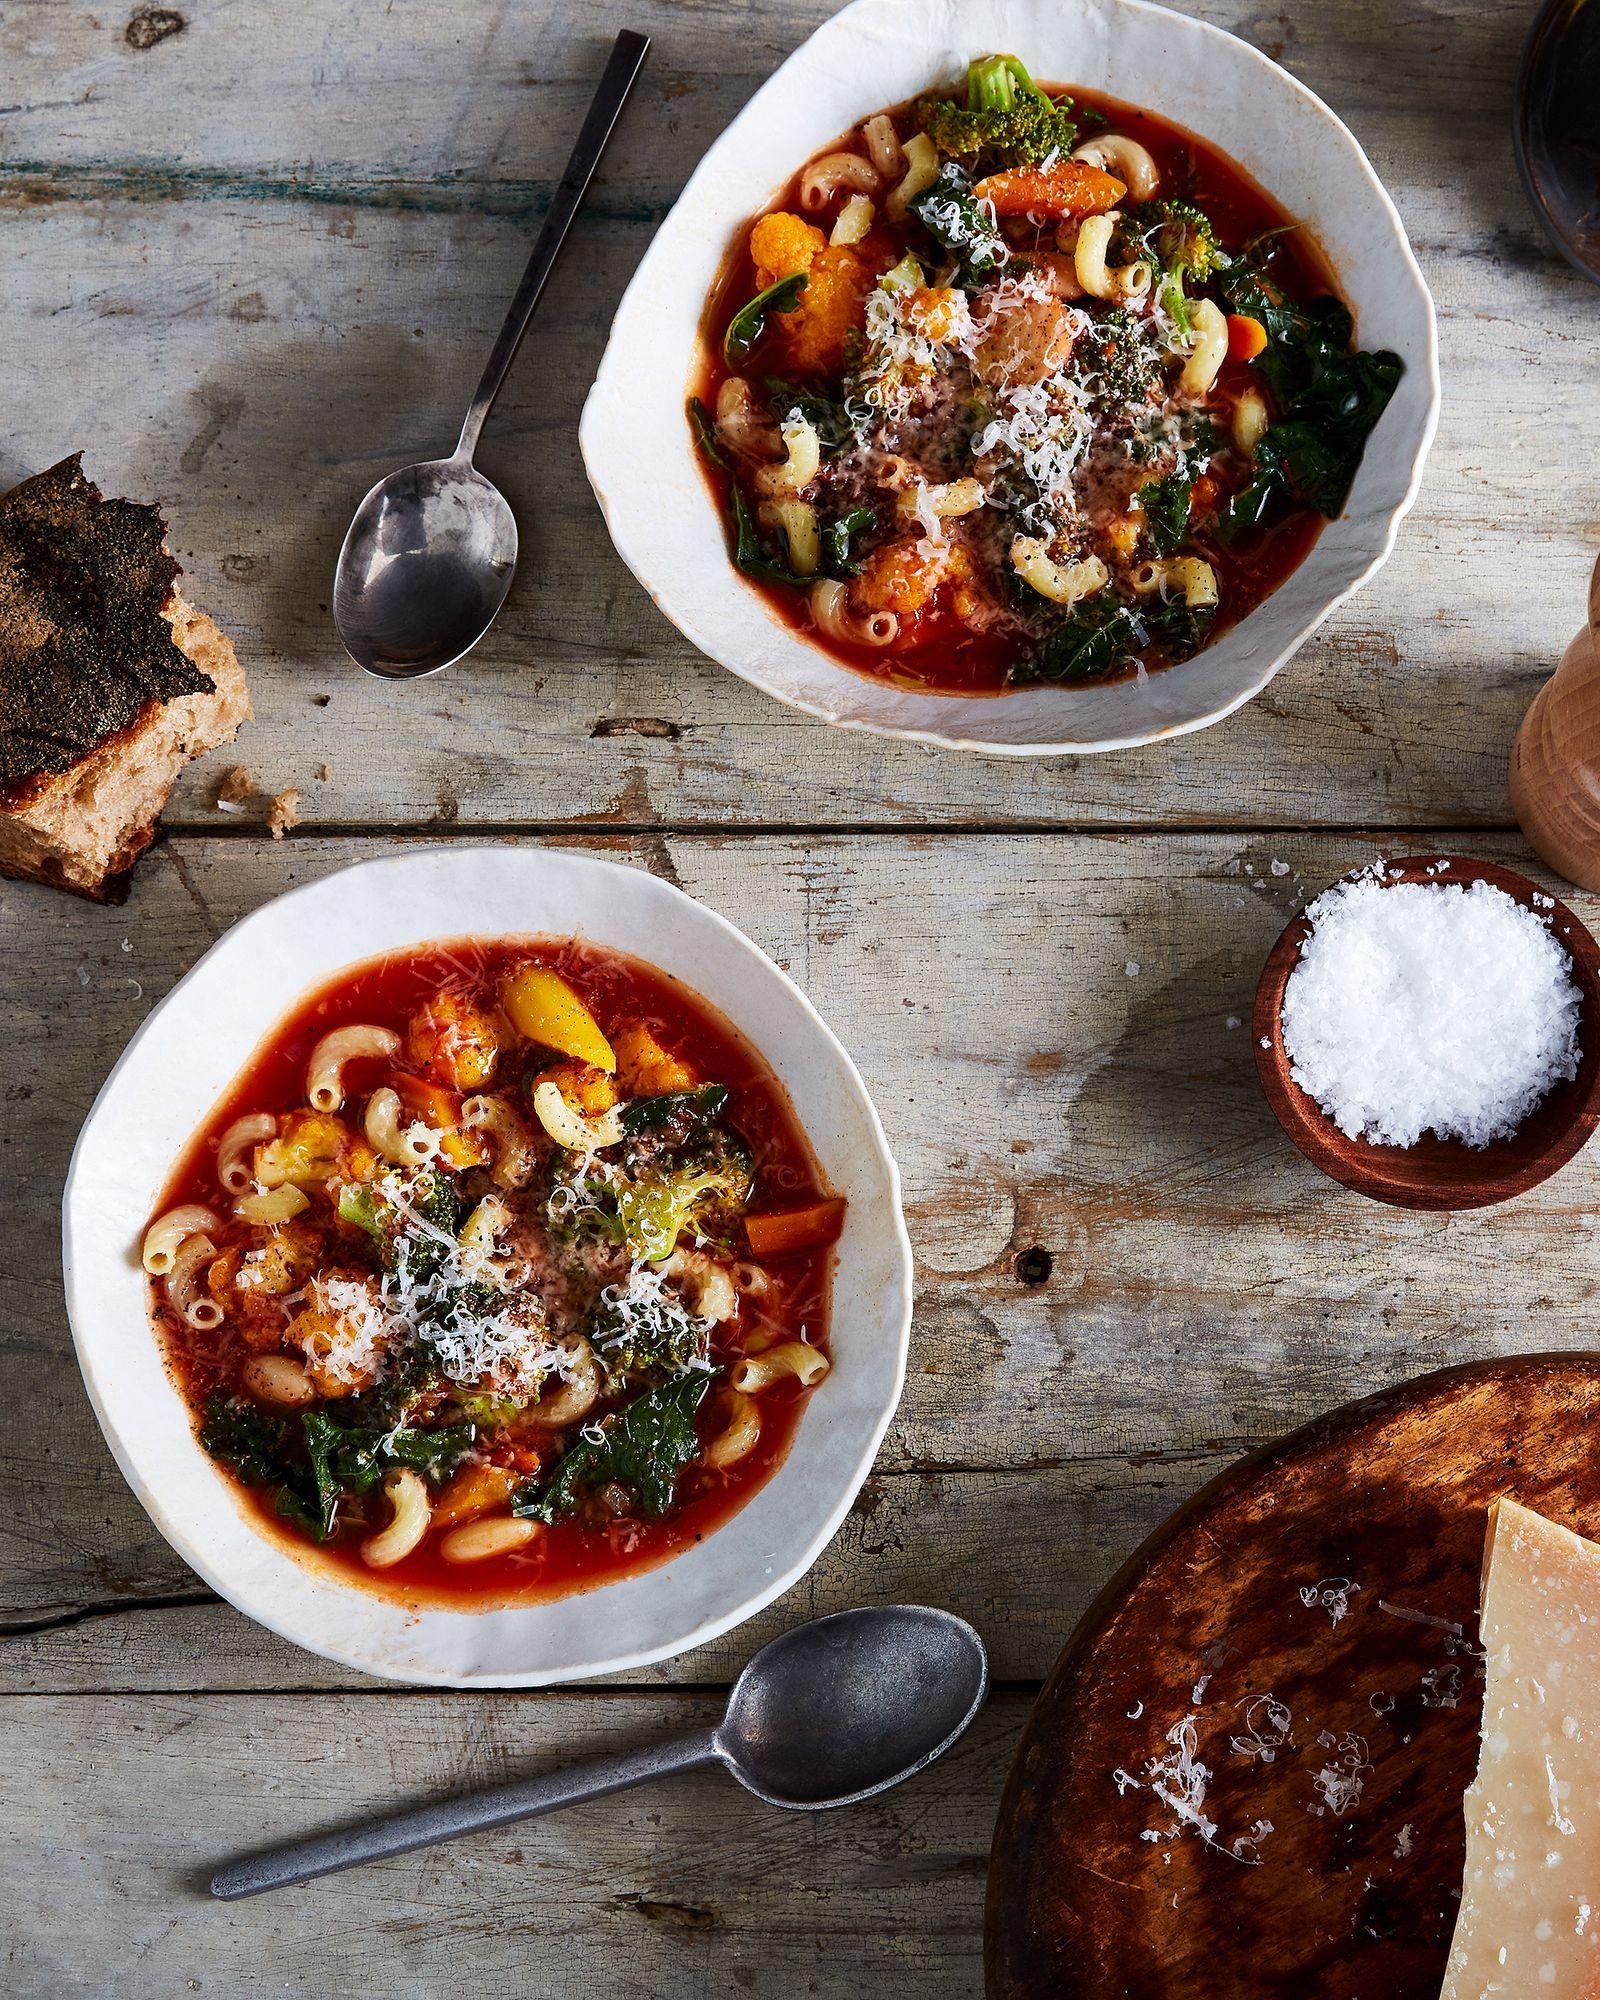 photo Desperation Dinners: Mushroom Soup